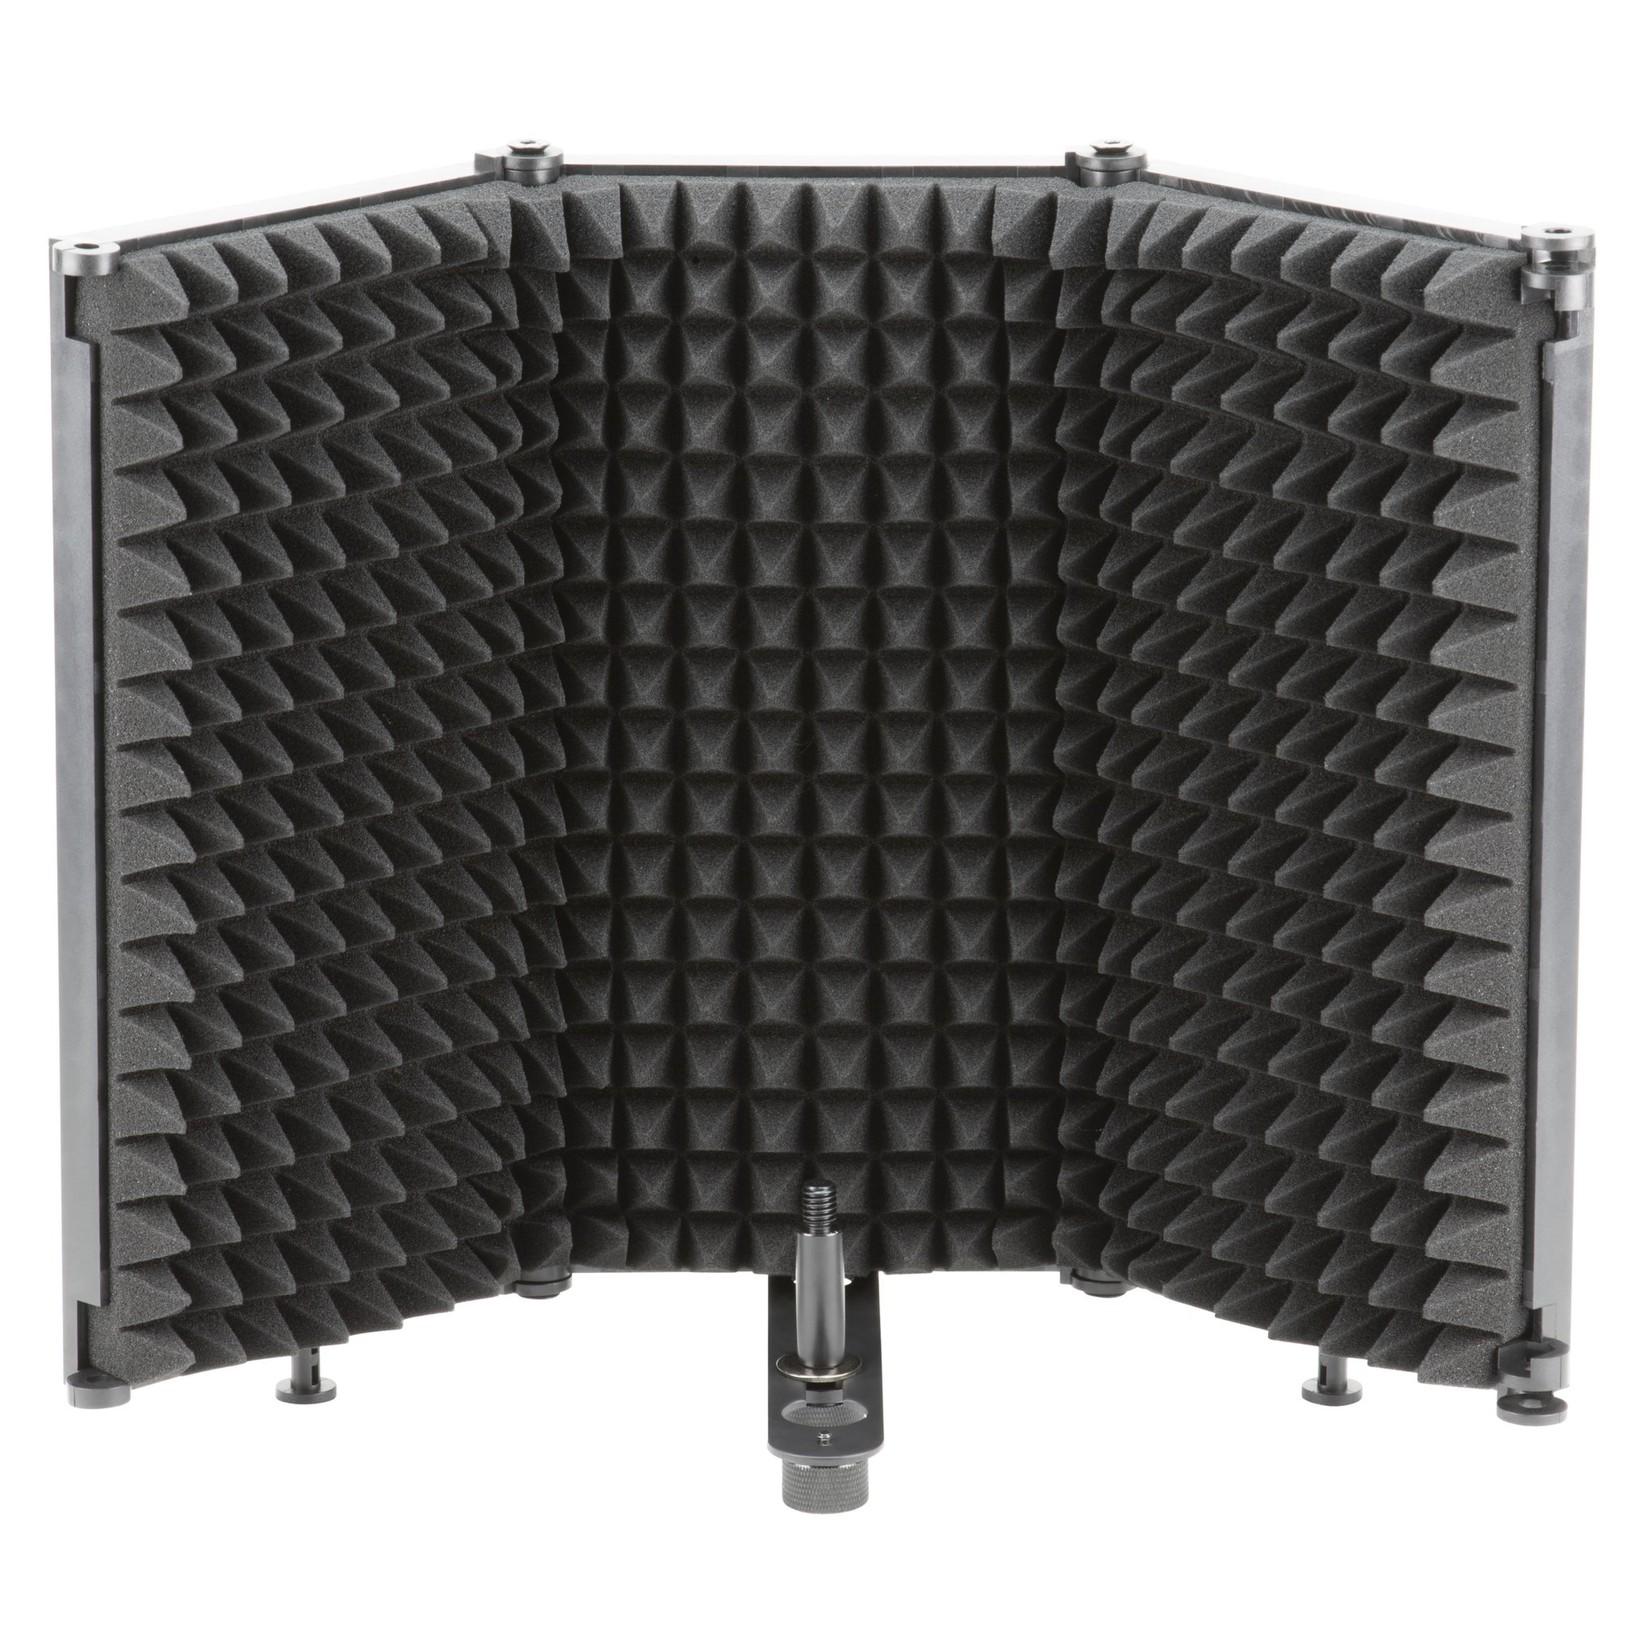 Pig Hog Pig Hog Microphone Isolation Shield - NEW!